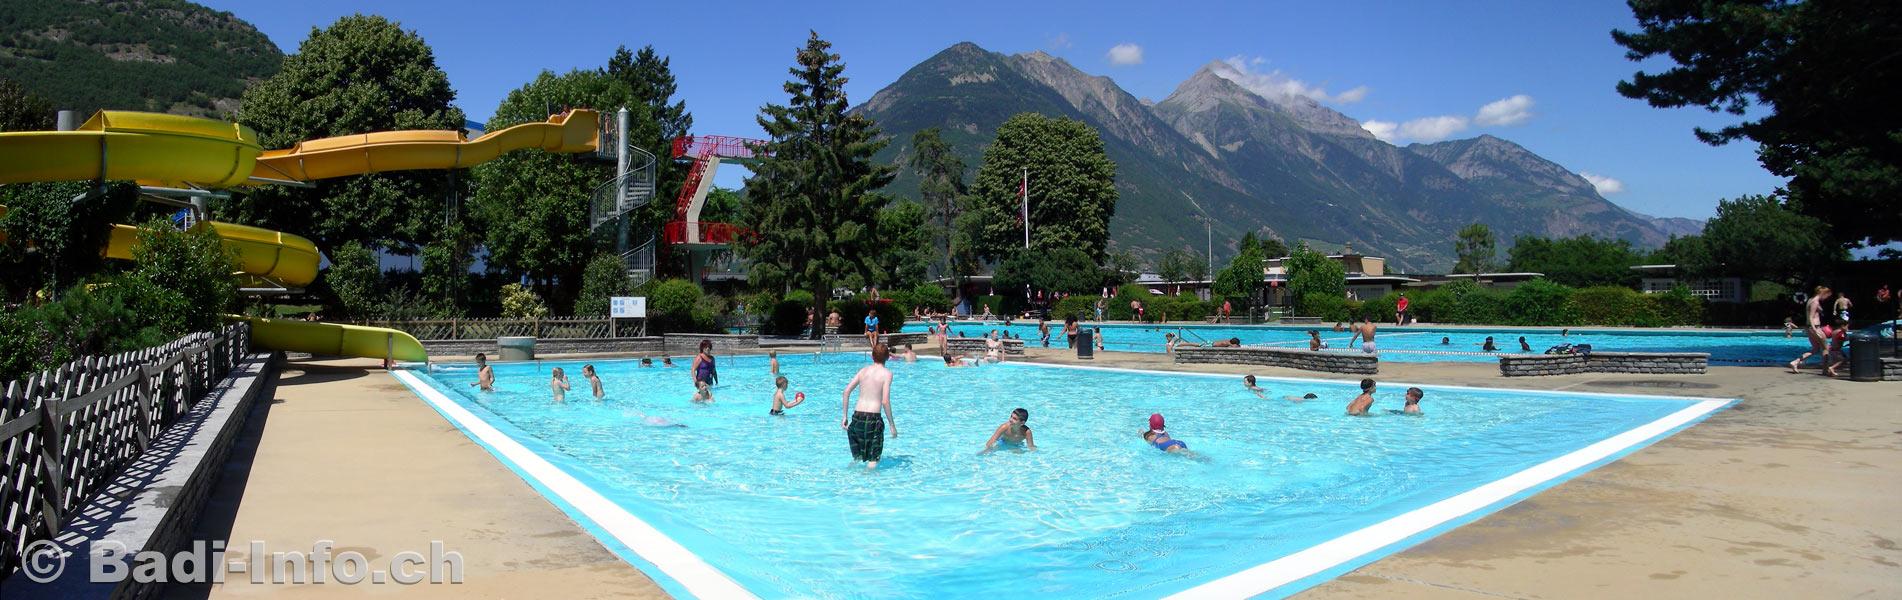 La piscine municipale de martigny valais for Piscine tubulaire pas cher gifi